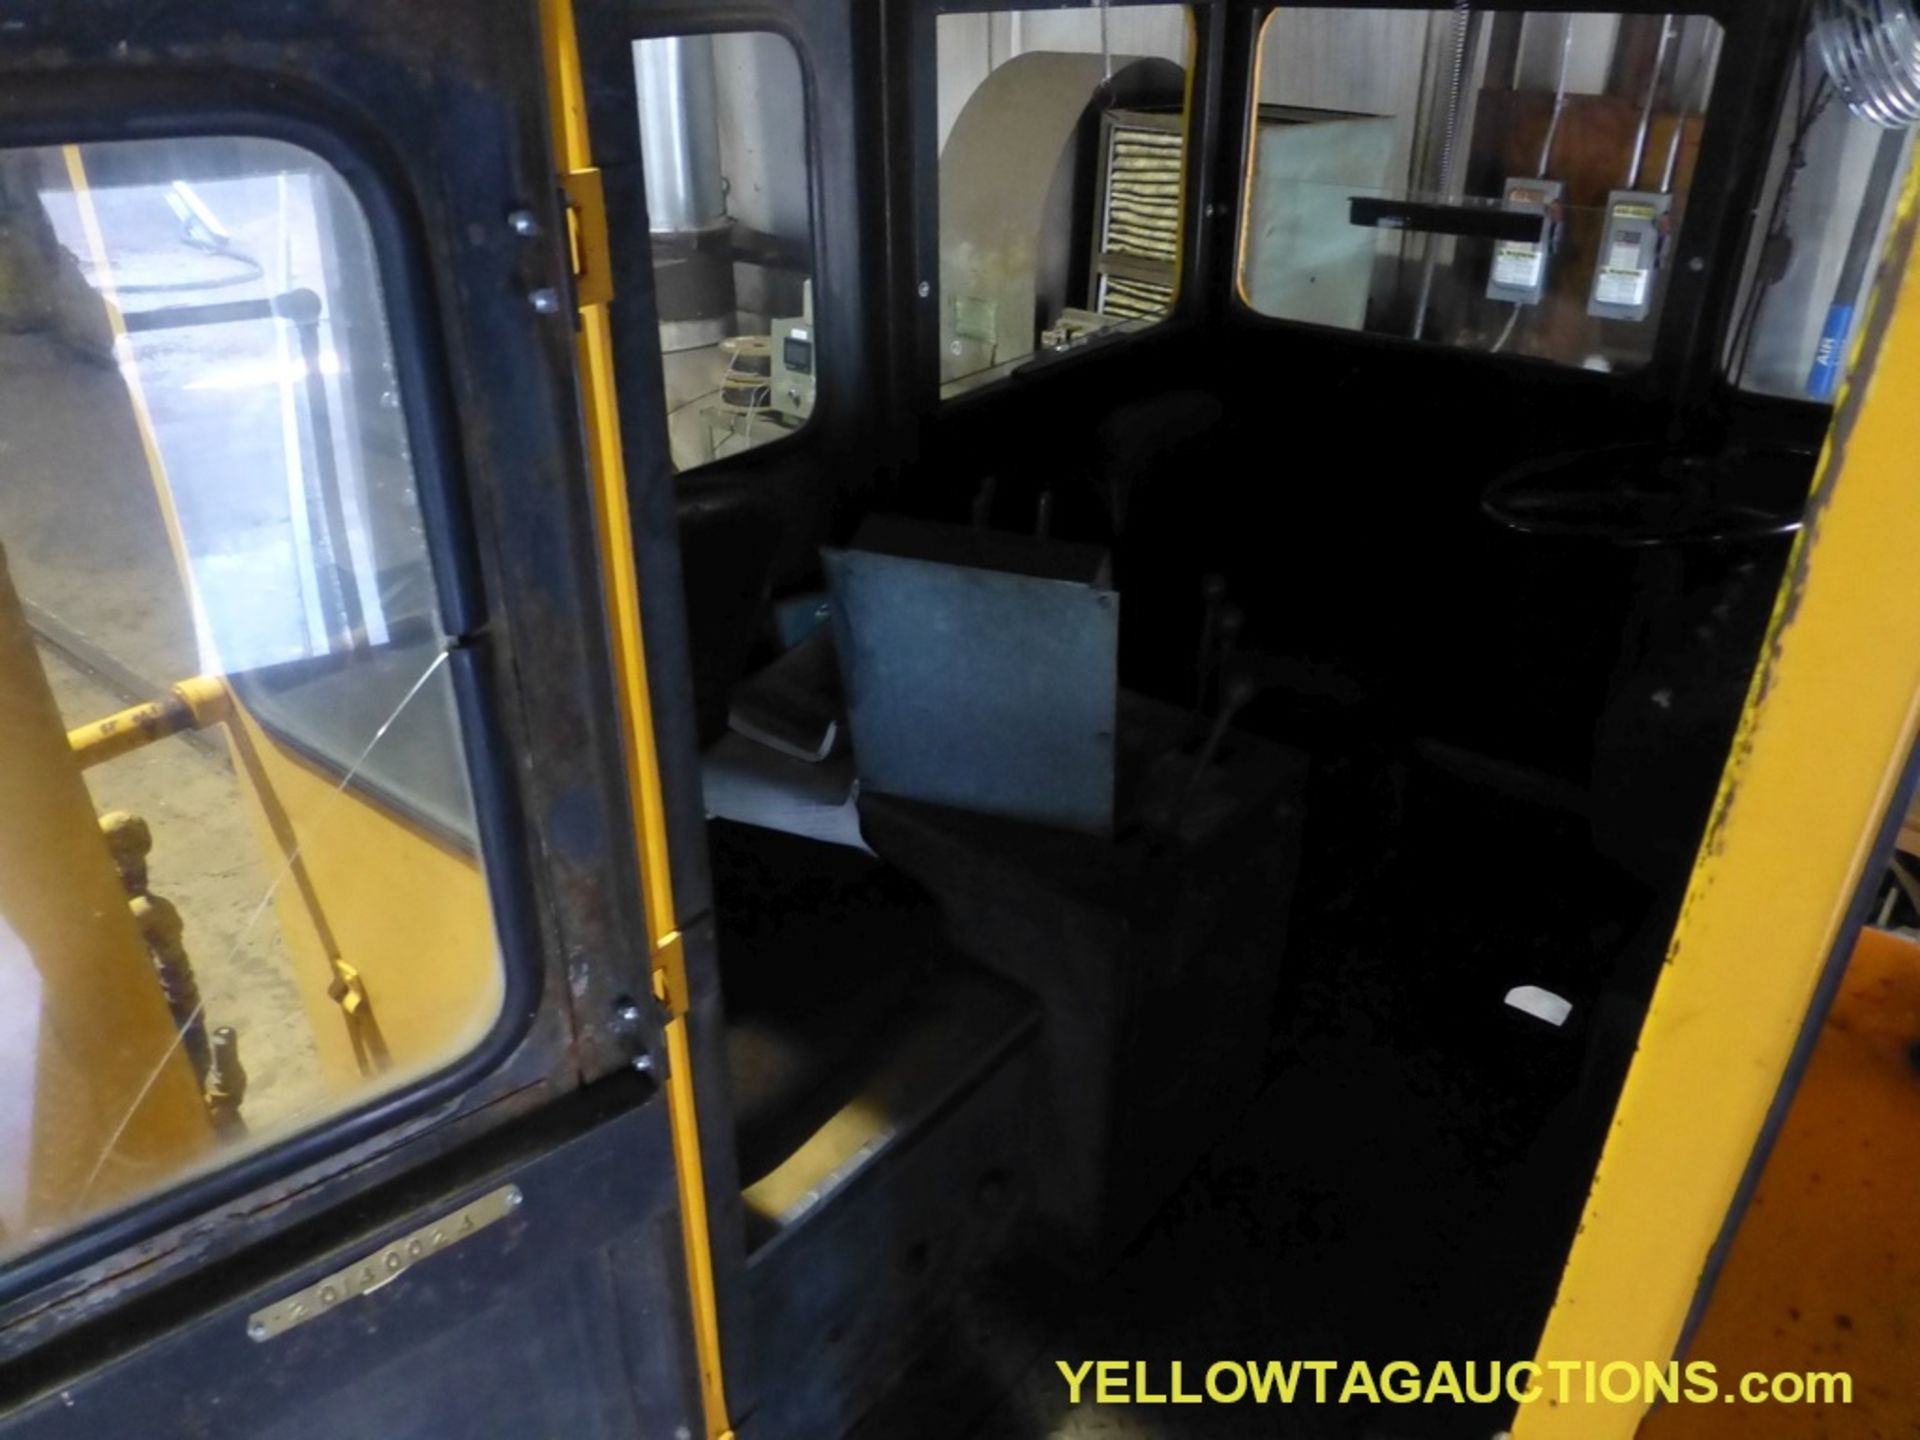 Track Mobile Rail Car Mover | Model No. 7TM; Bad Tie Rod - Image 5 of 42